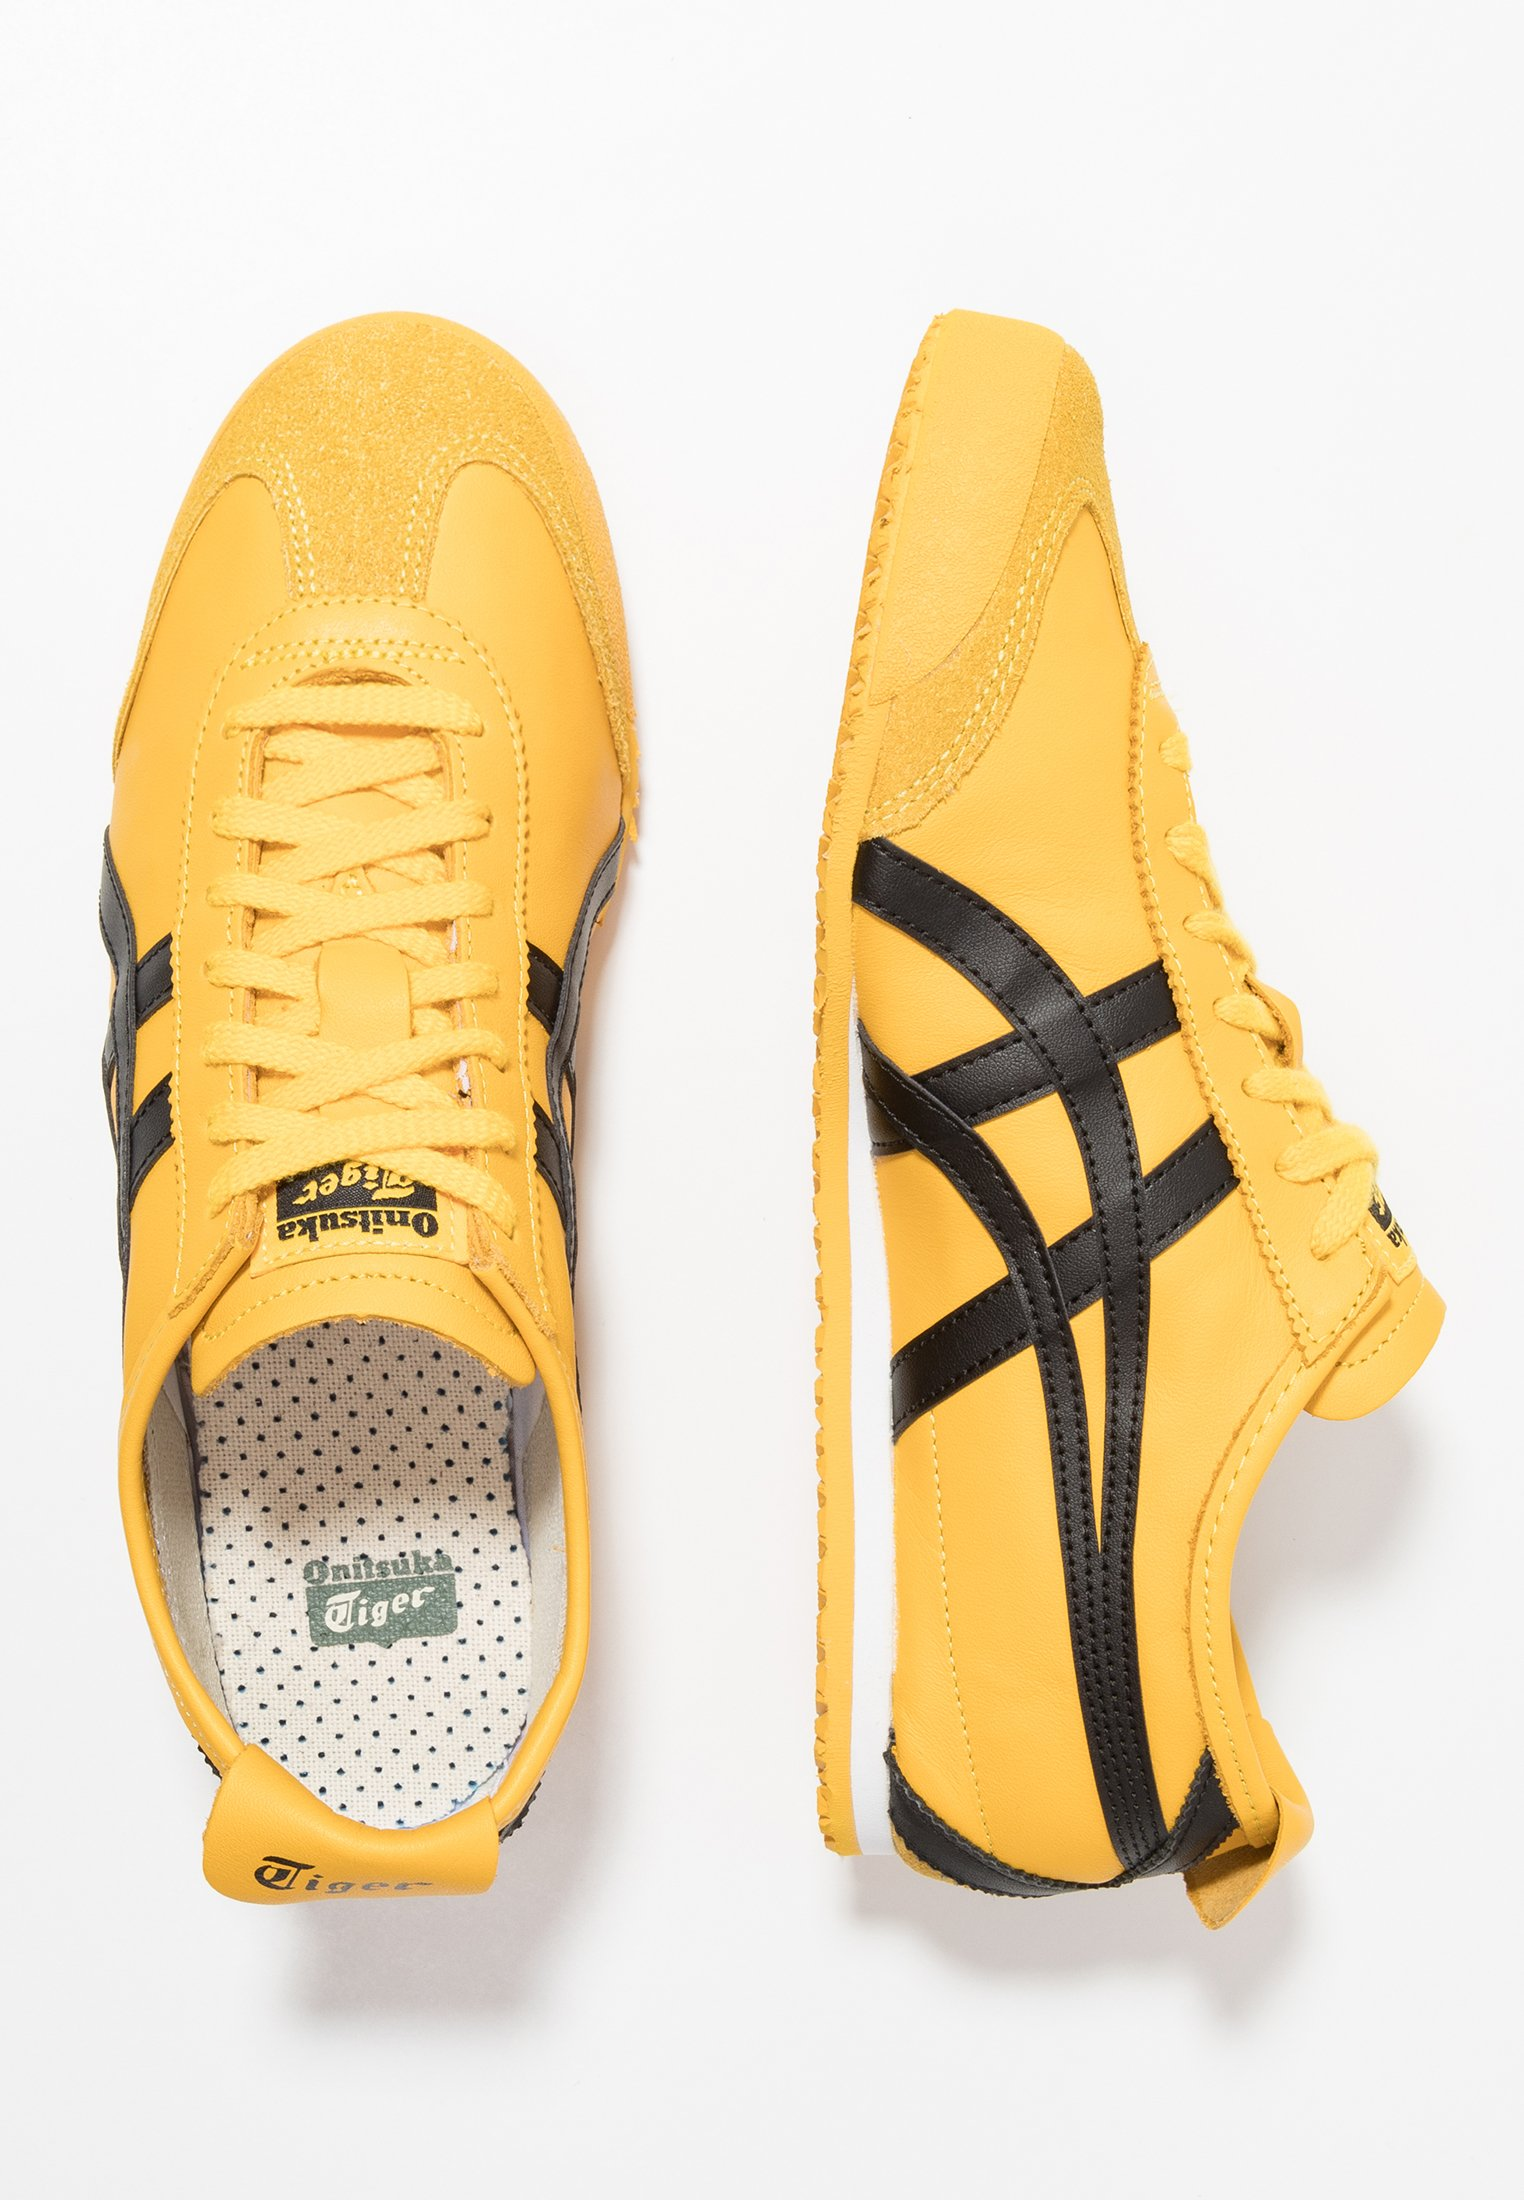 onitsuka tiger mexico 66 jaune 99